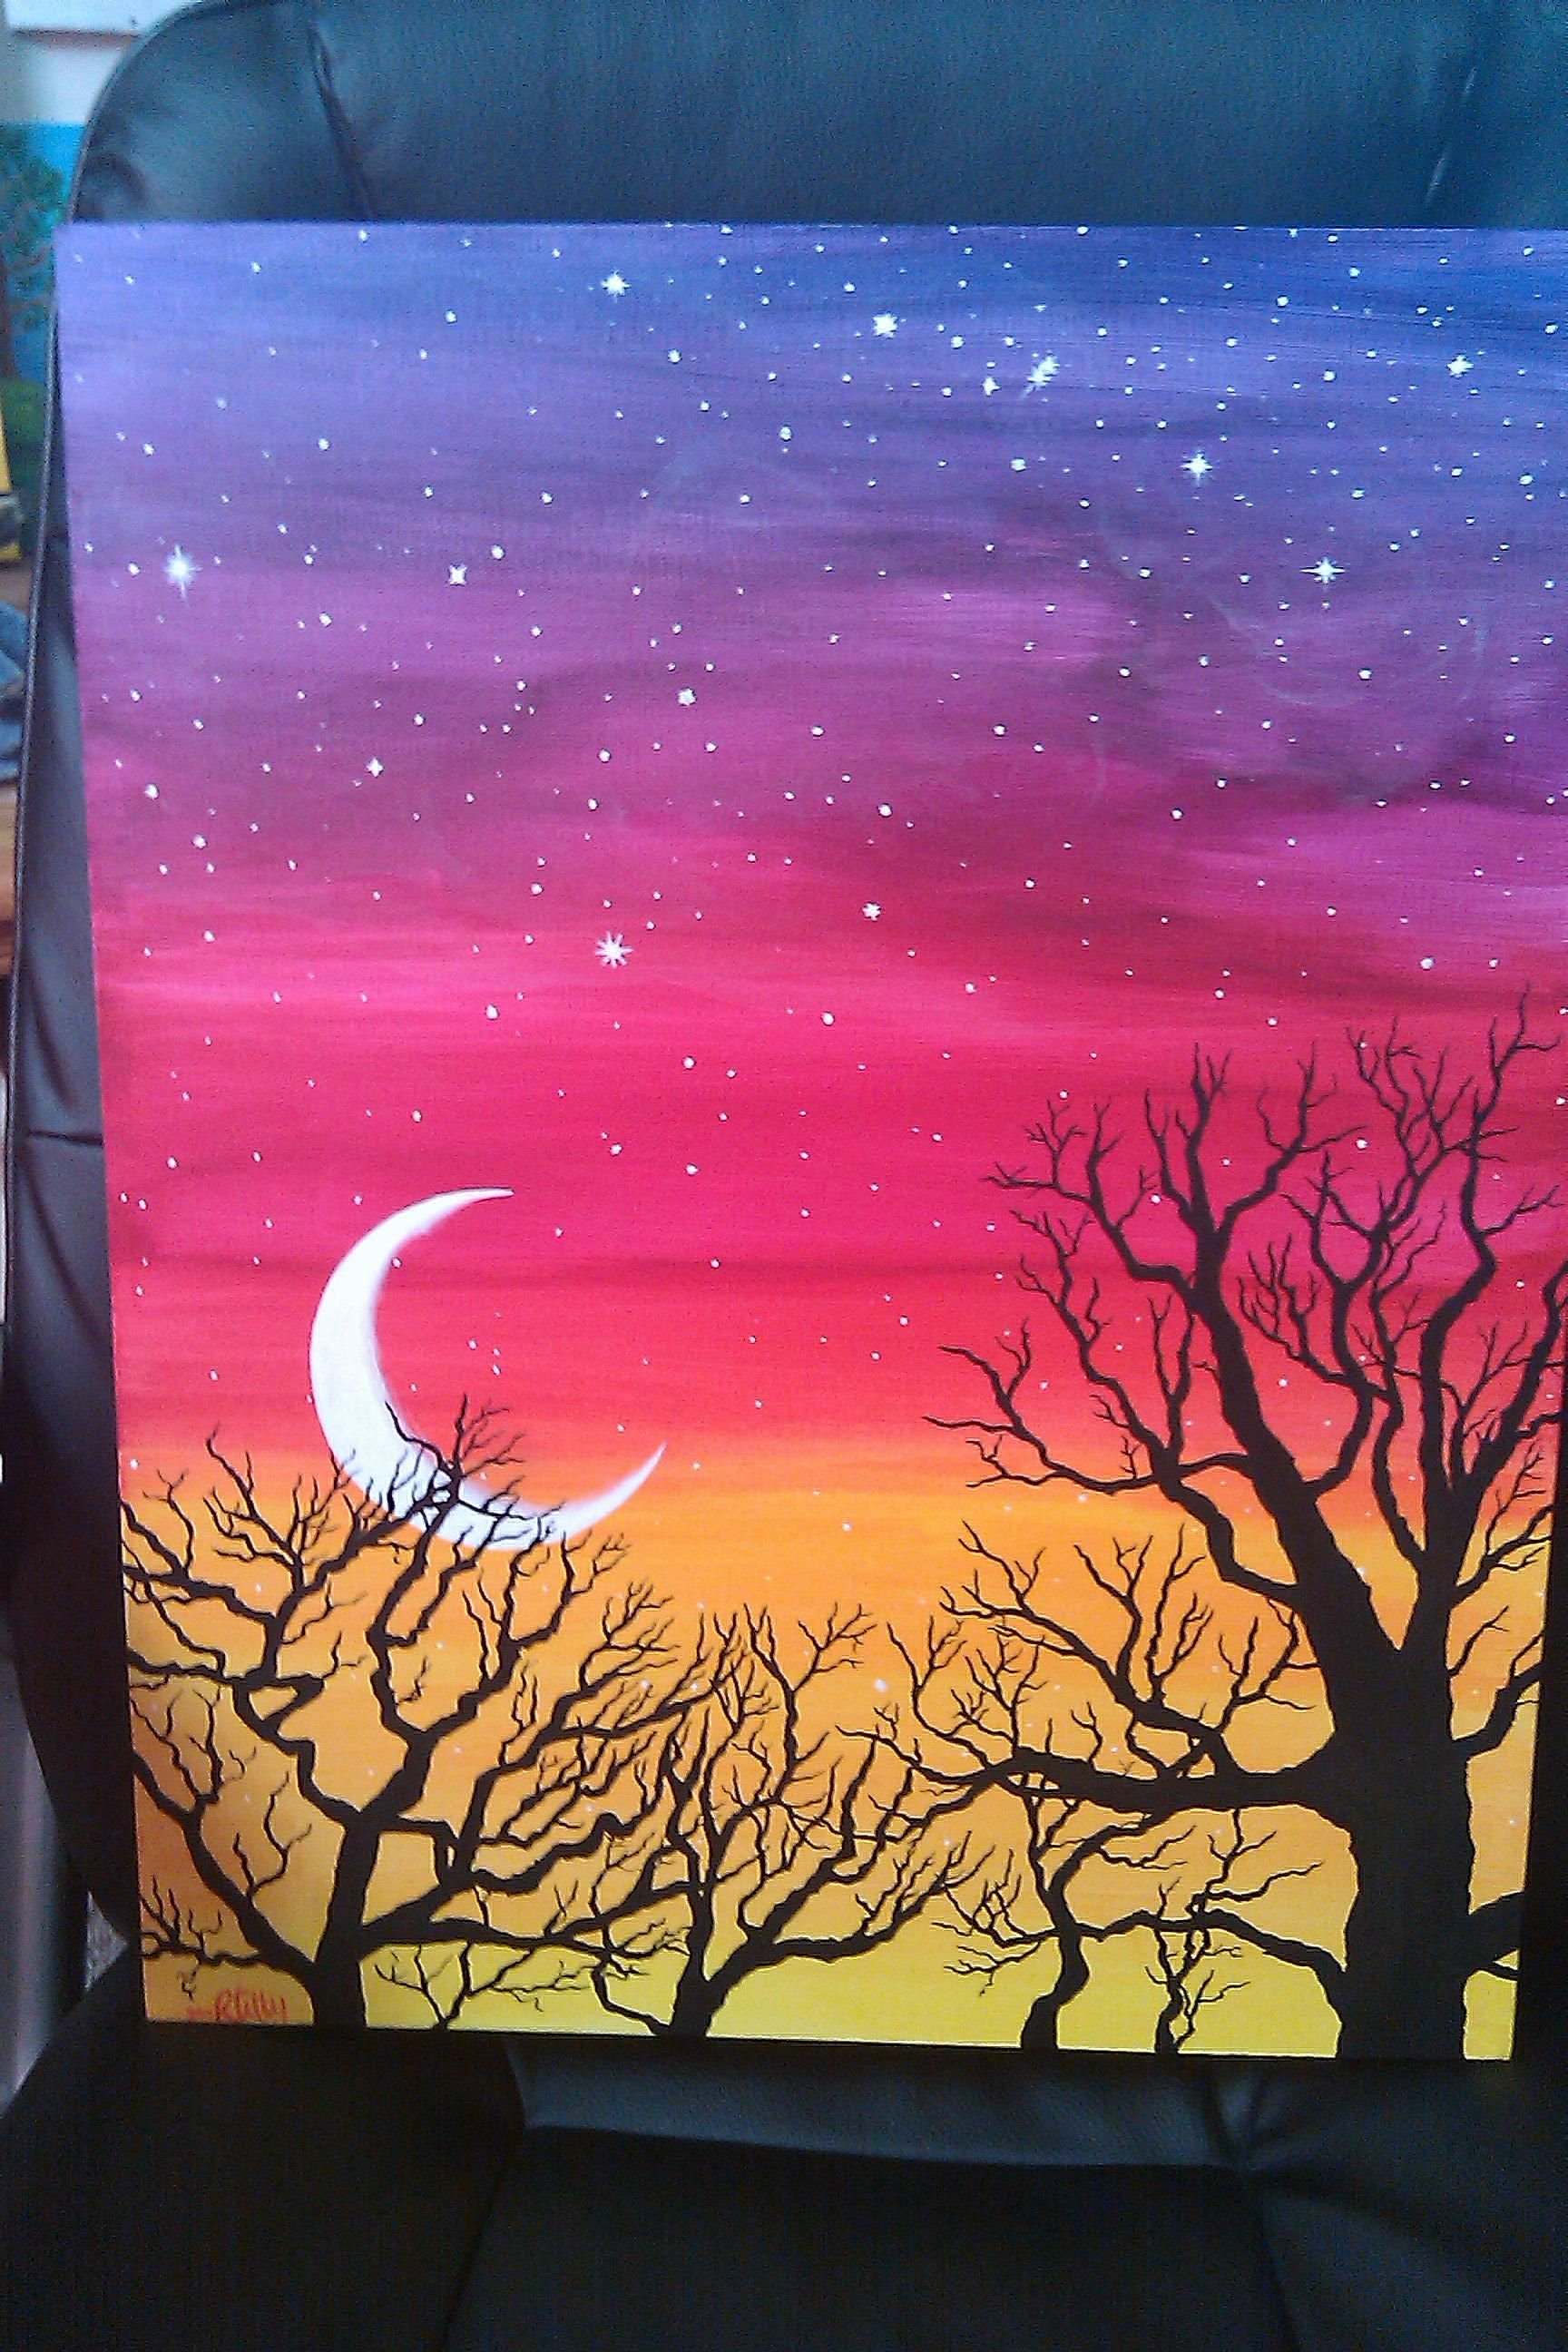 Untitled Sky Tree Motif Pintura De Arte Pintura Y Dibujo Arte En Lienzo